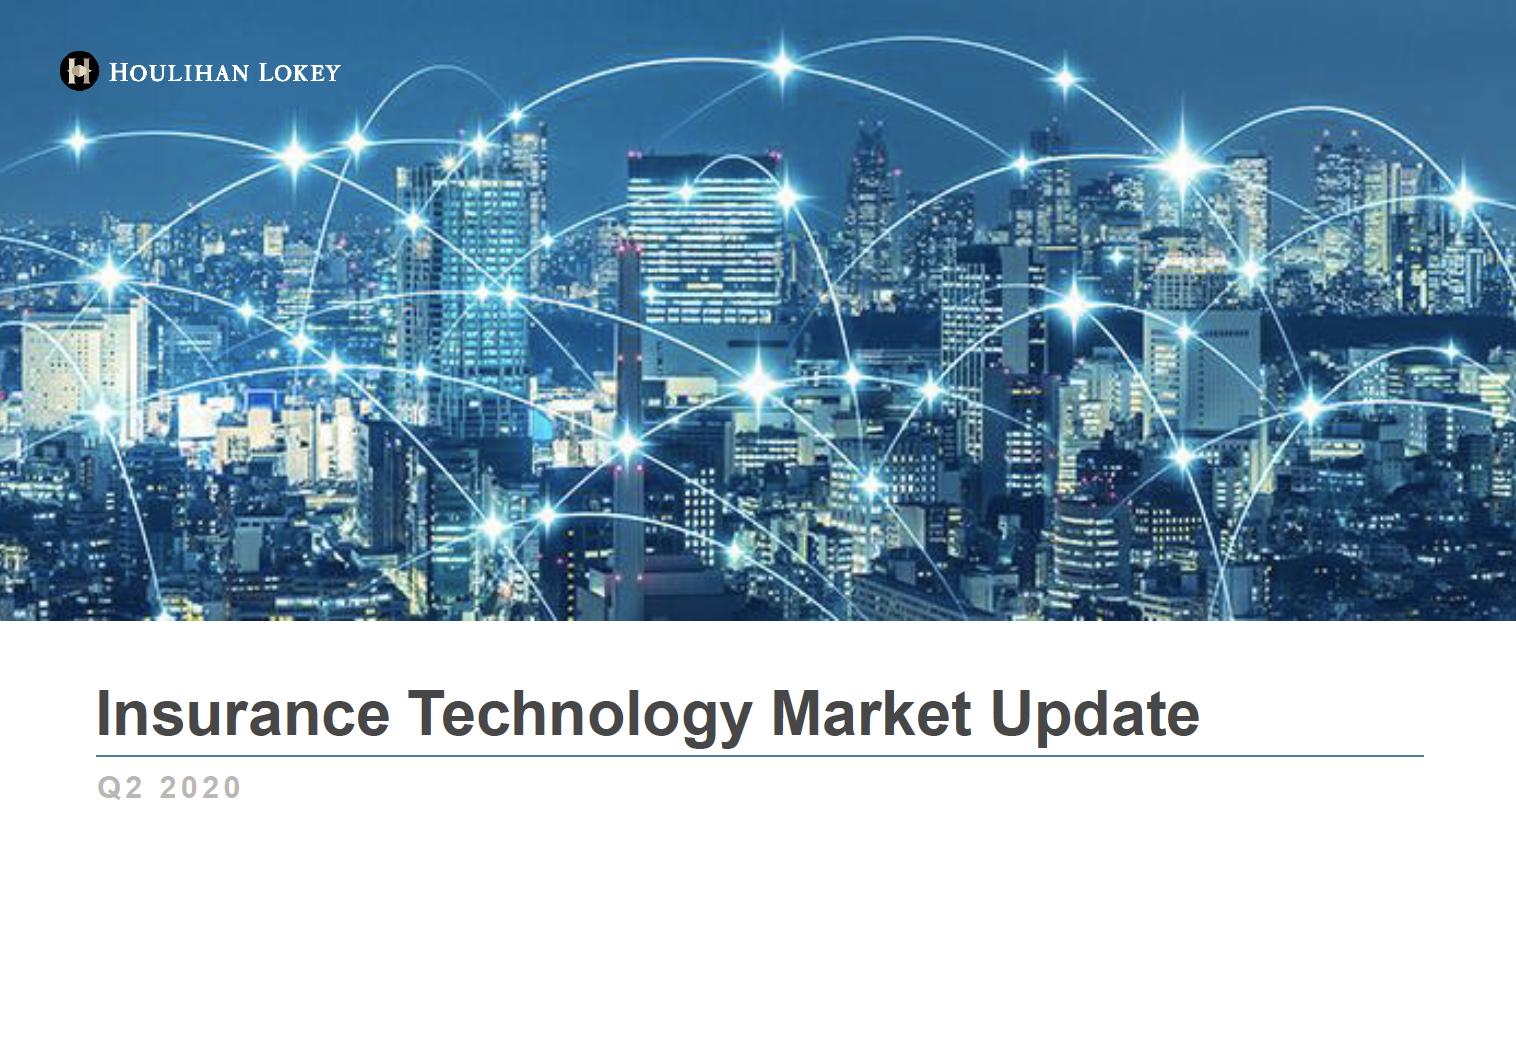 Houlihan Lokey Insurance Technology Market Update